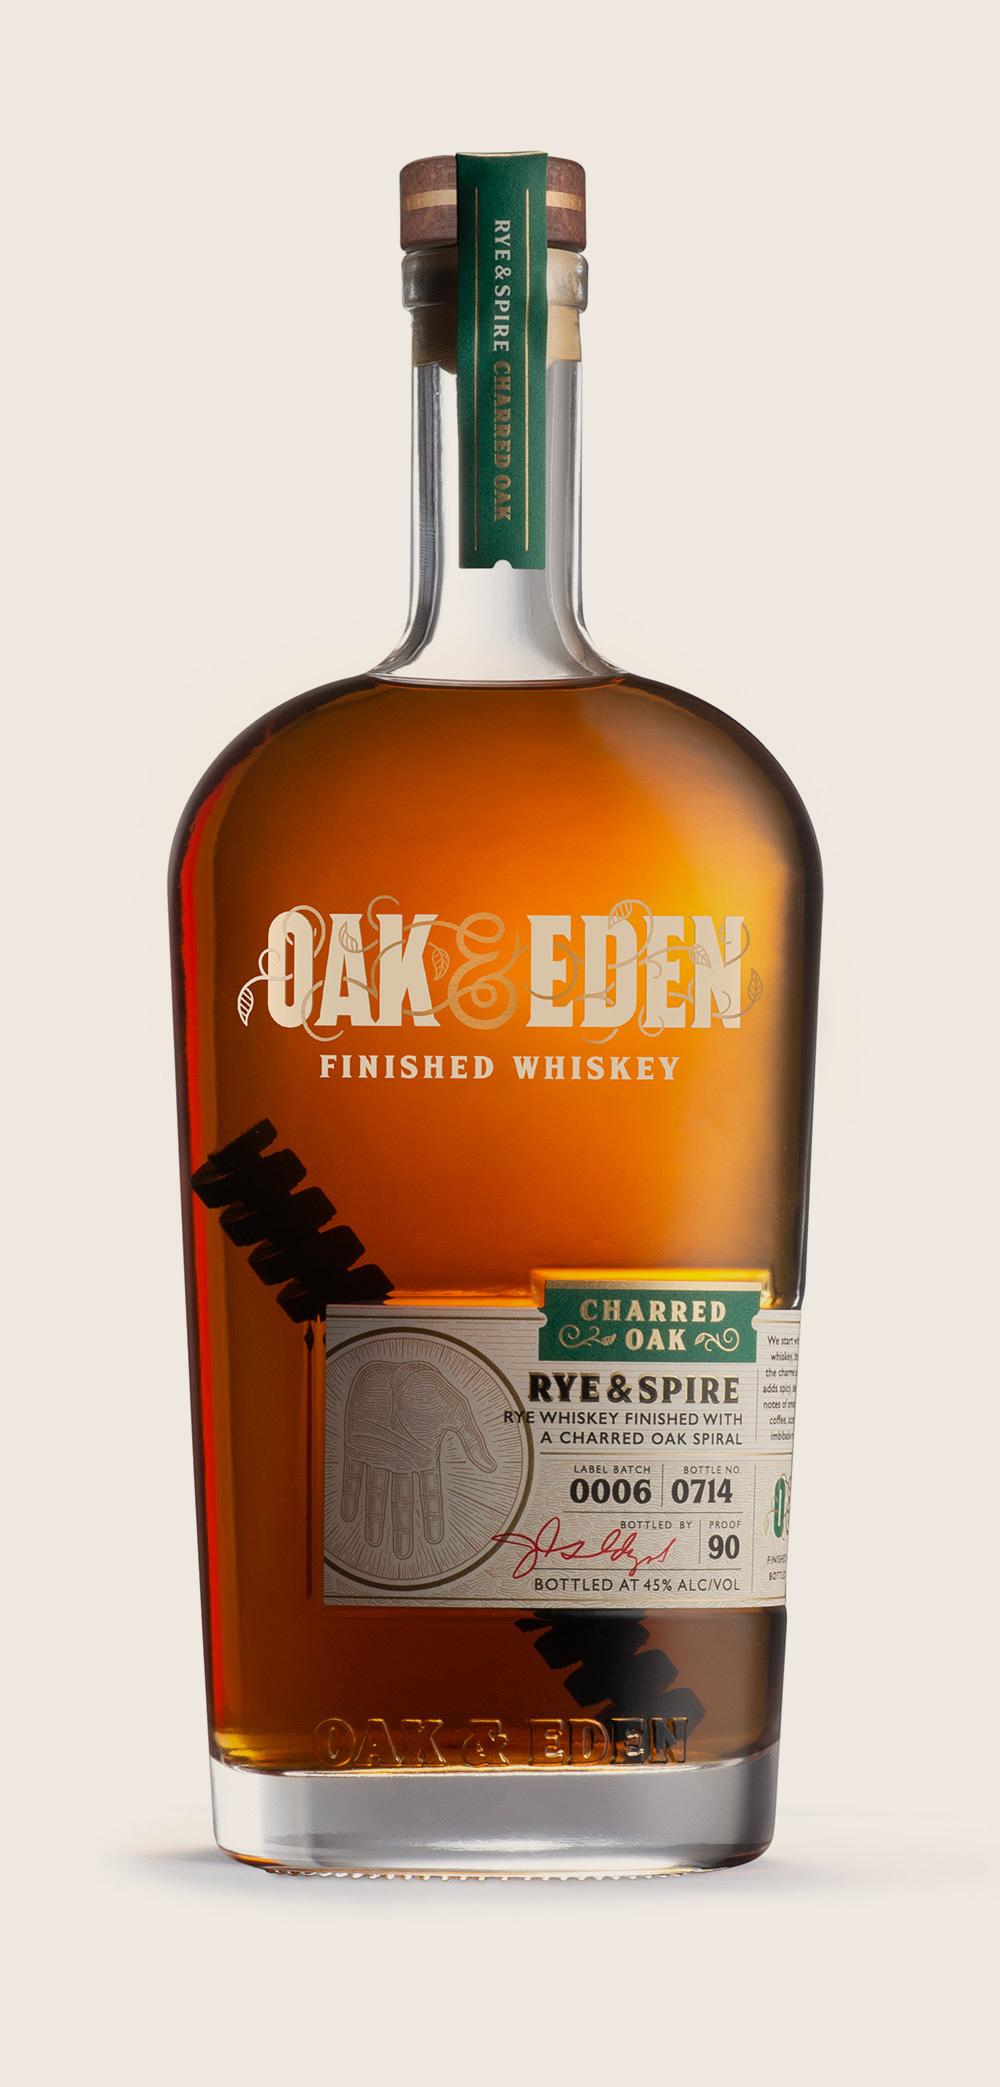 Oak & Eden Rye & Spire